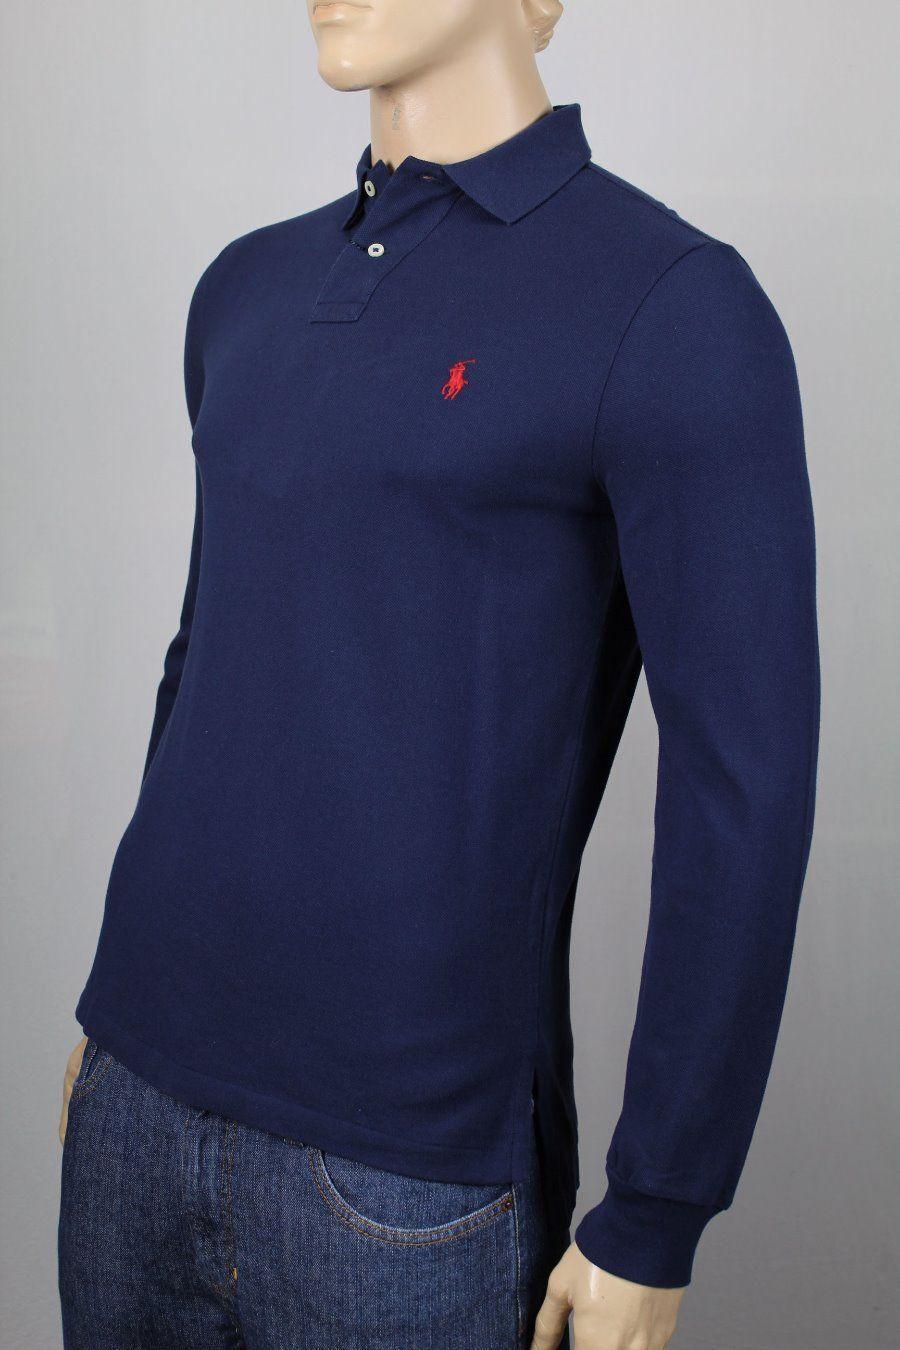 Polo Ralph Lauren Navy bluee Mesh Long Sleeve Shirt Red Pony NWT